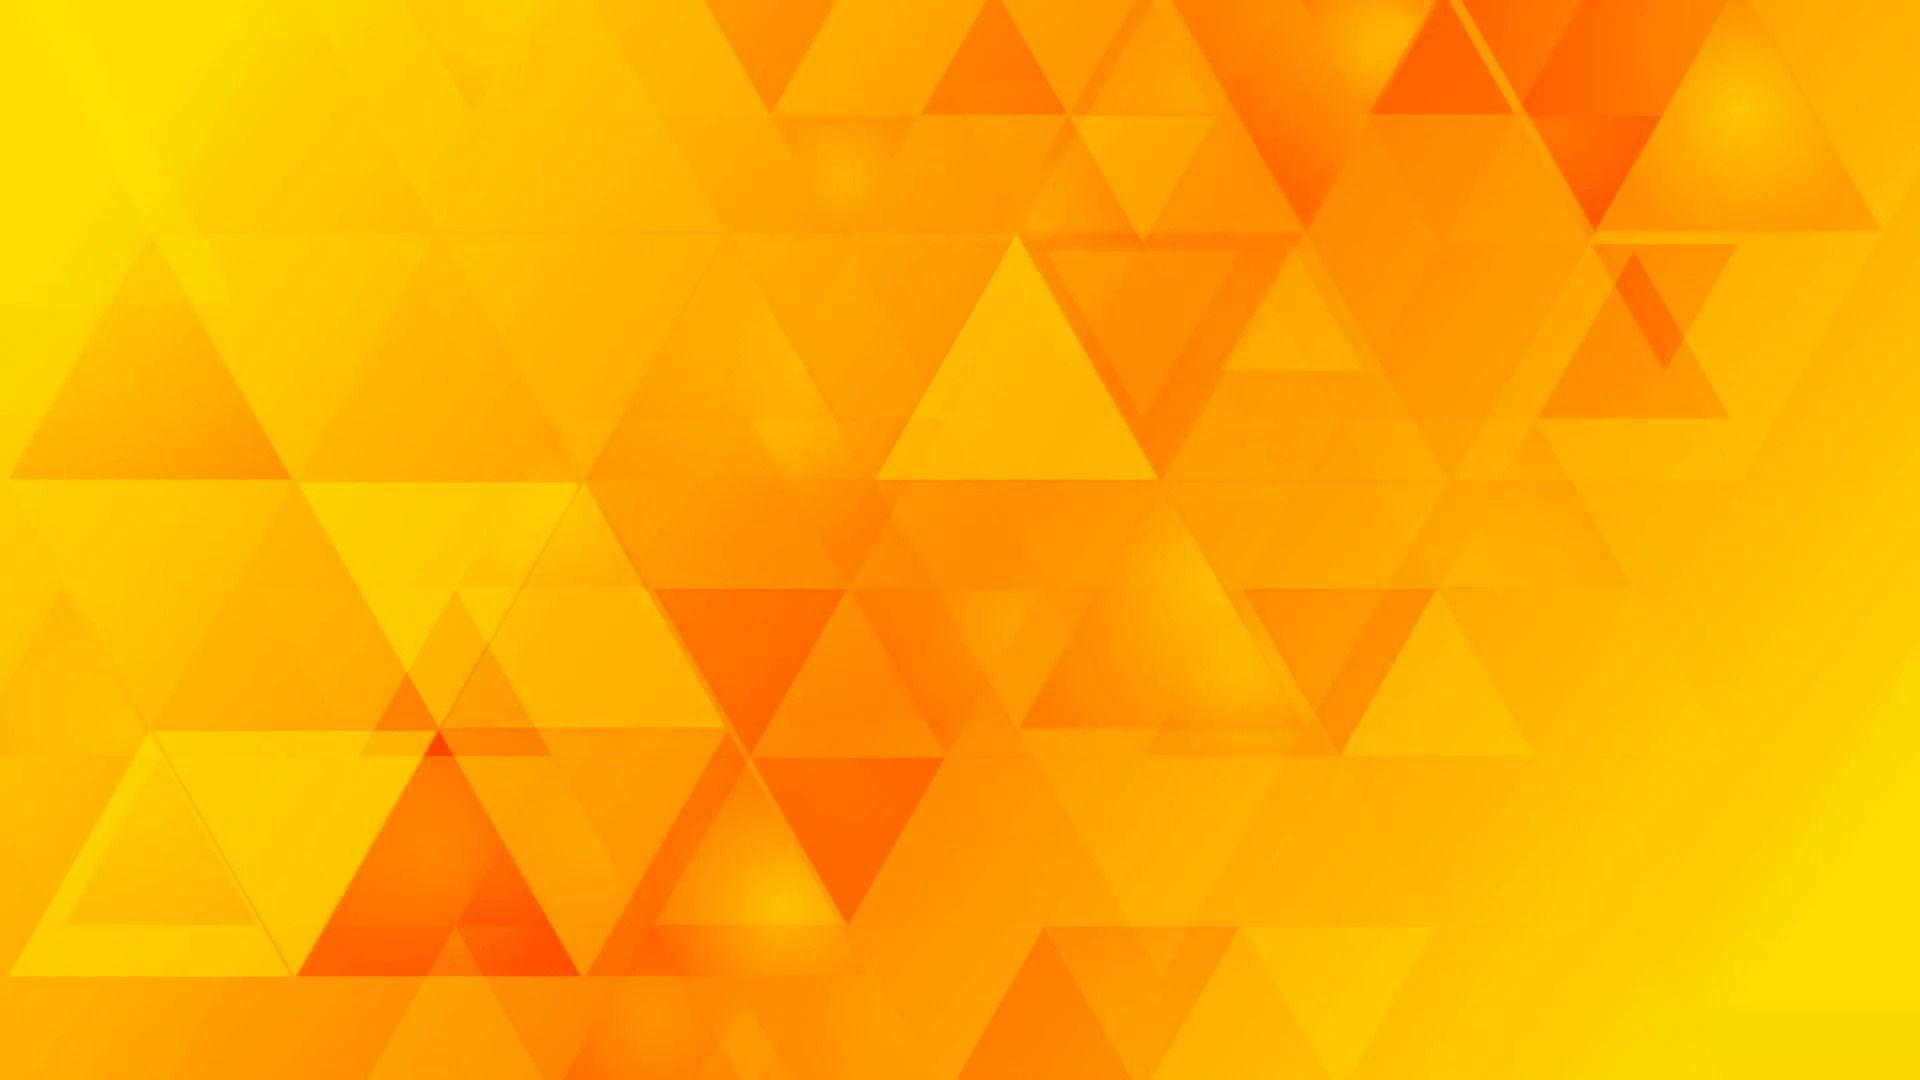 https://cdn.flow.page/images/8dc5dec6-533f-4014-a5e7-22da613a175e-background?m=1622296024